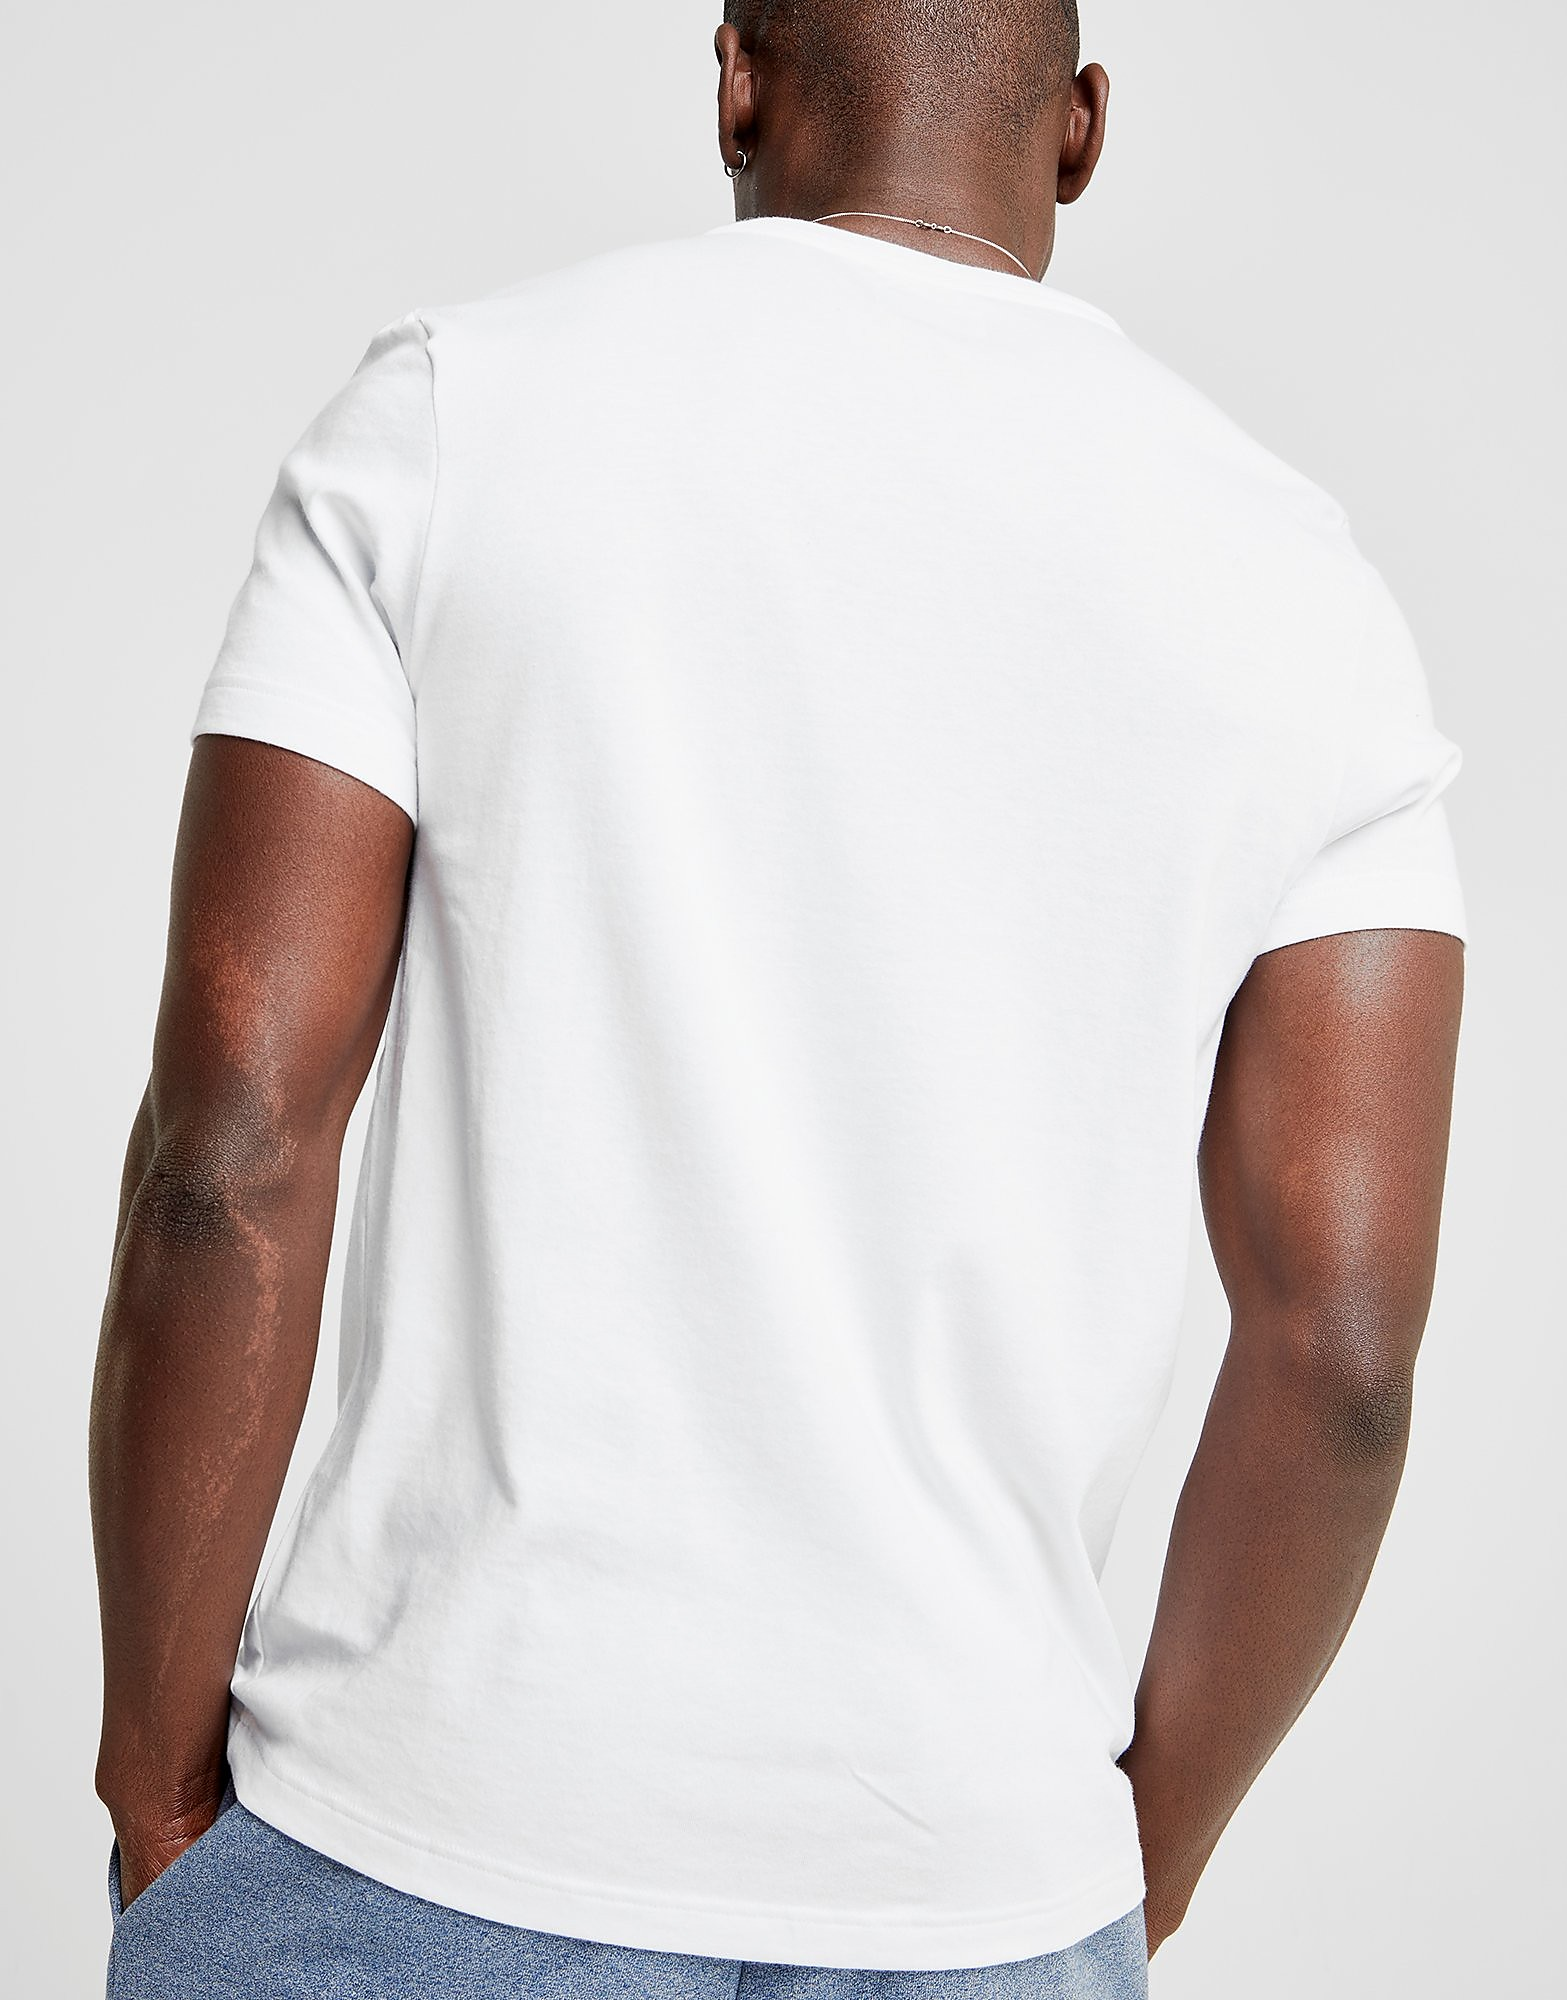 Lacoste Large Croc Short Sleeve T-Shirt Heren